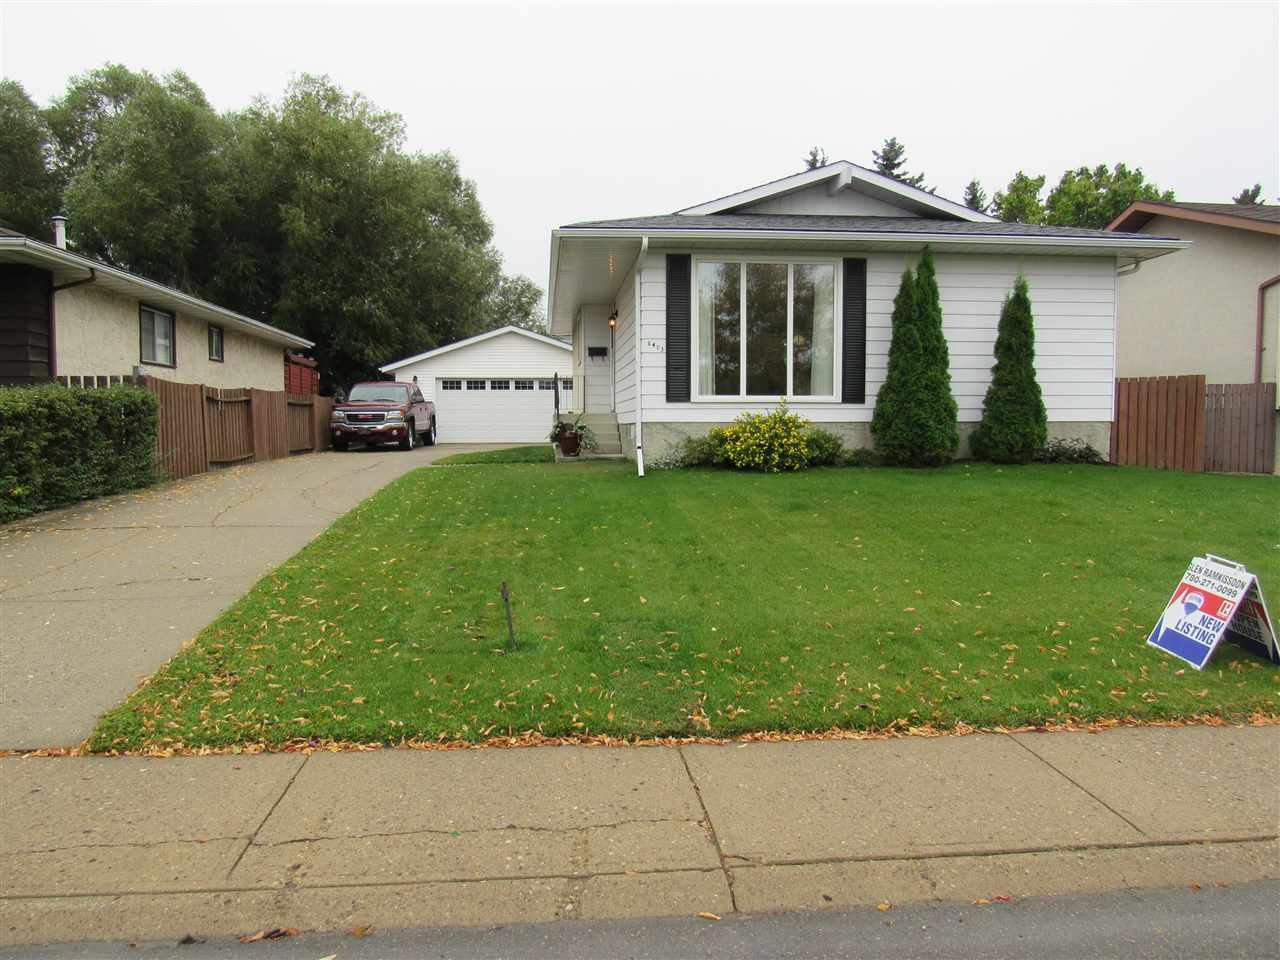 Main Photo: 6403 15 Avenue in Edmonton: Zone 29 House for sale : MLS®# E4173088